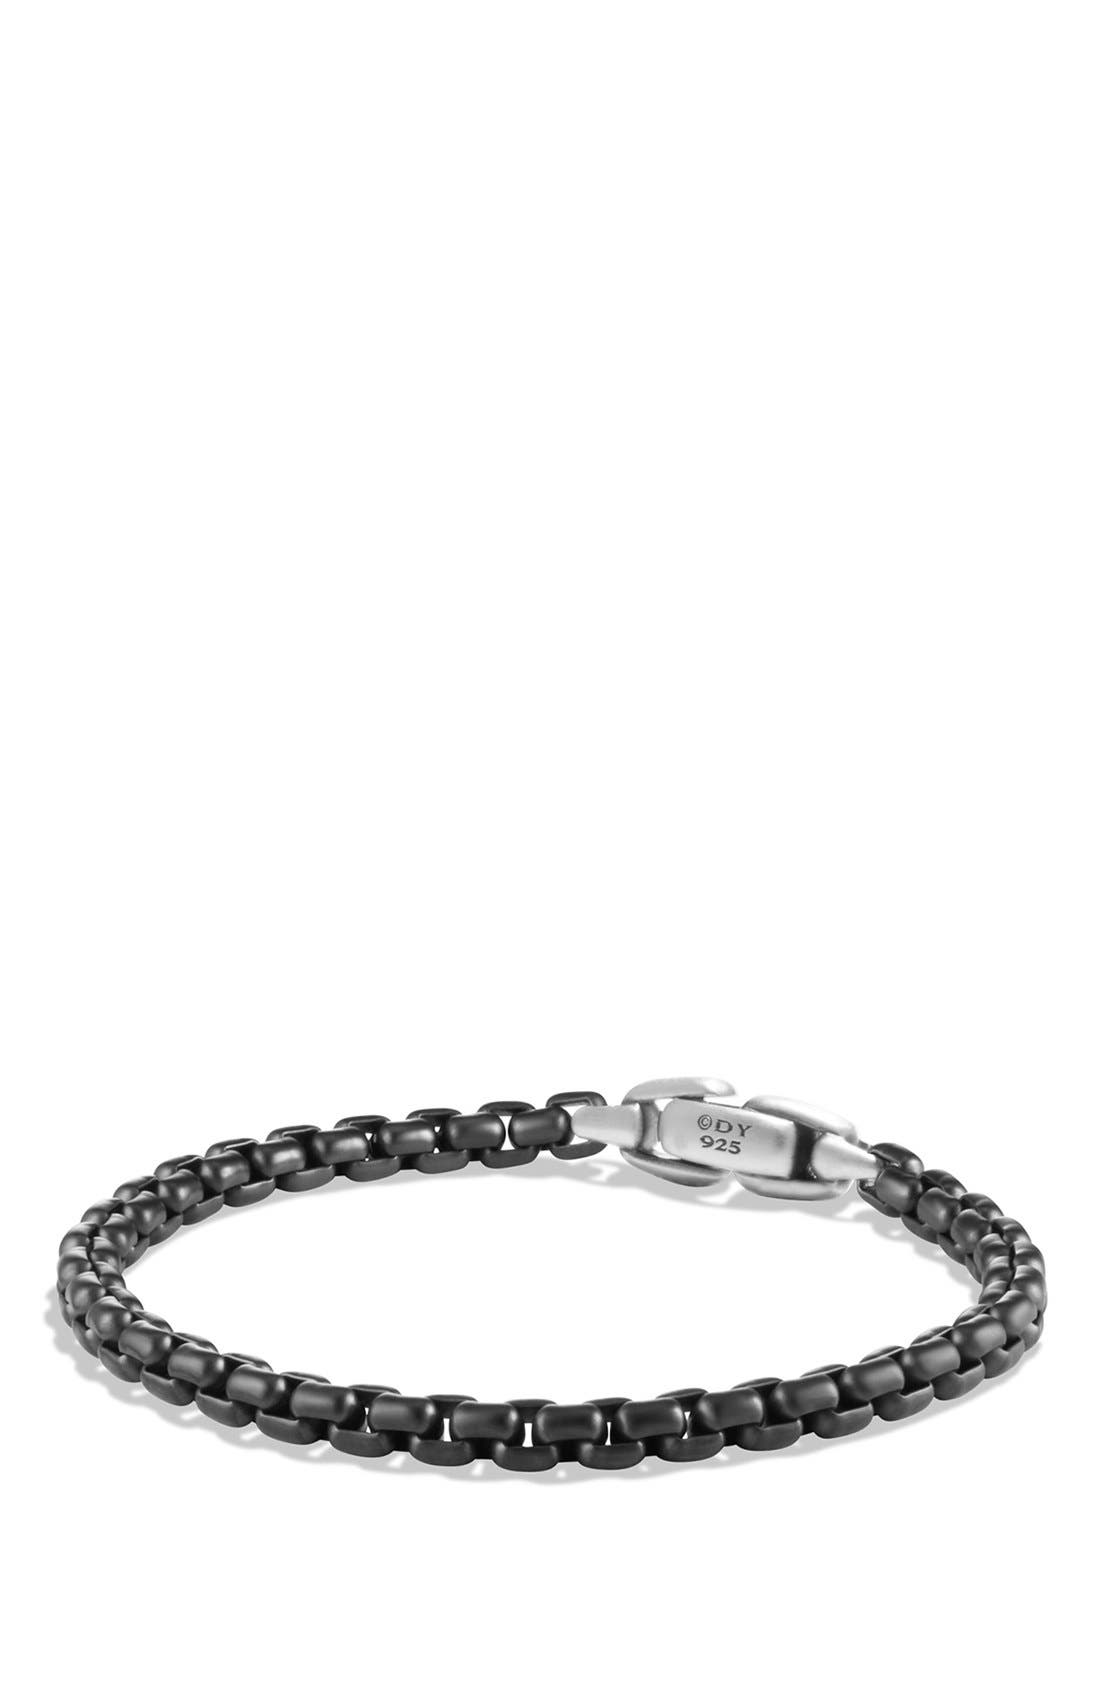 Main Image - David Yurman Box Chain Bracelet